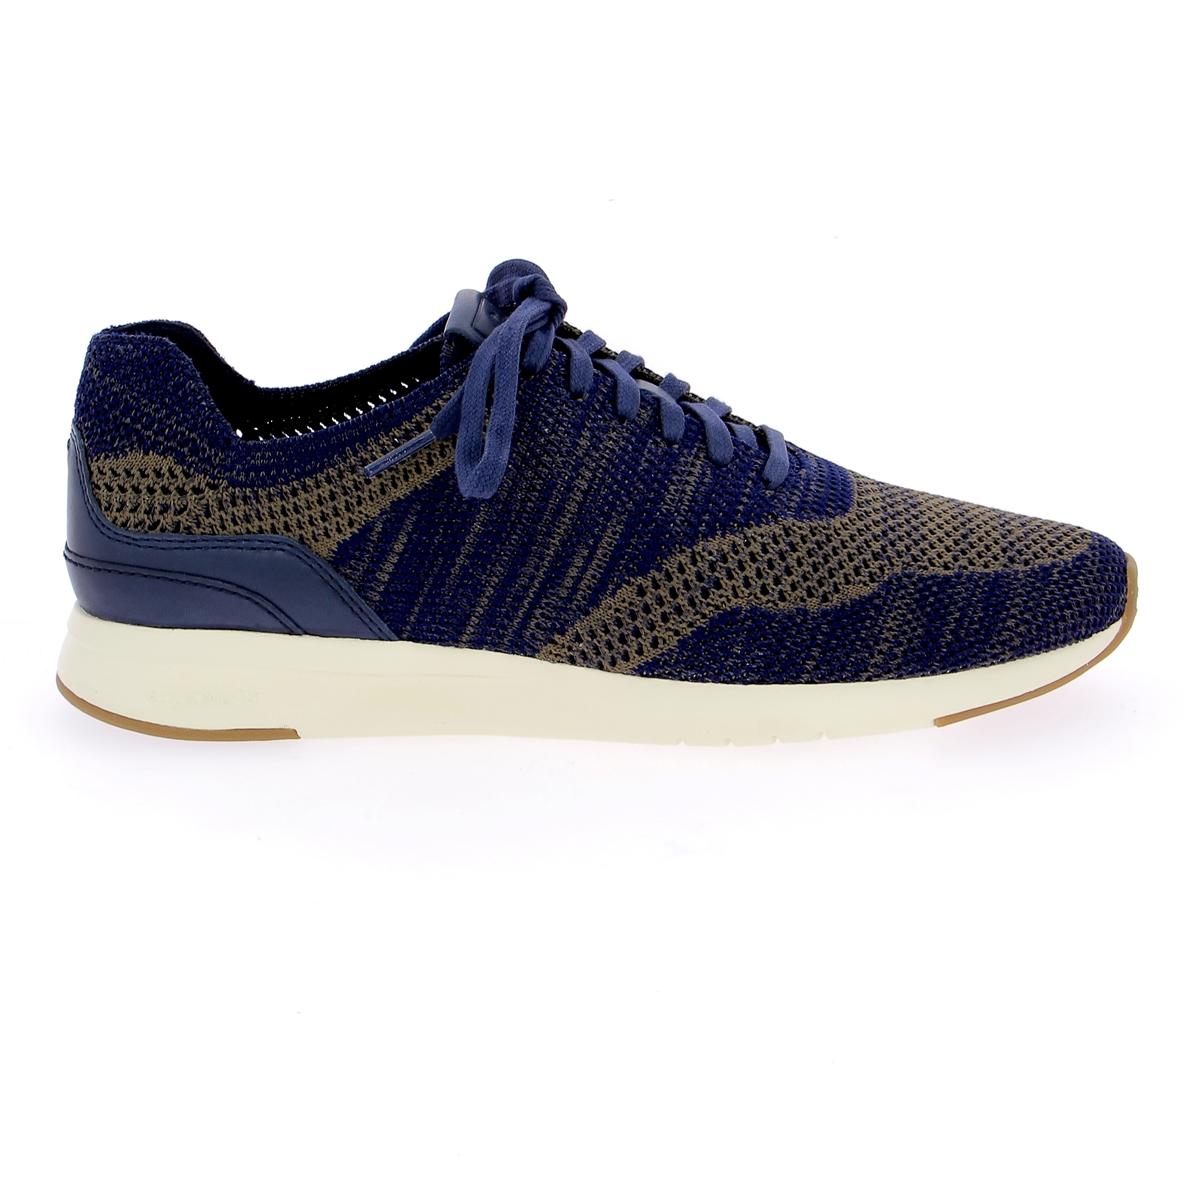 Cole Haan Basket bleu